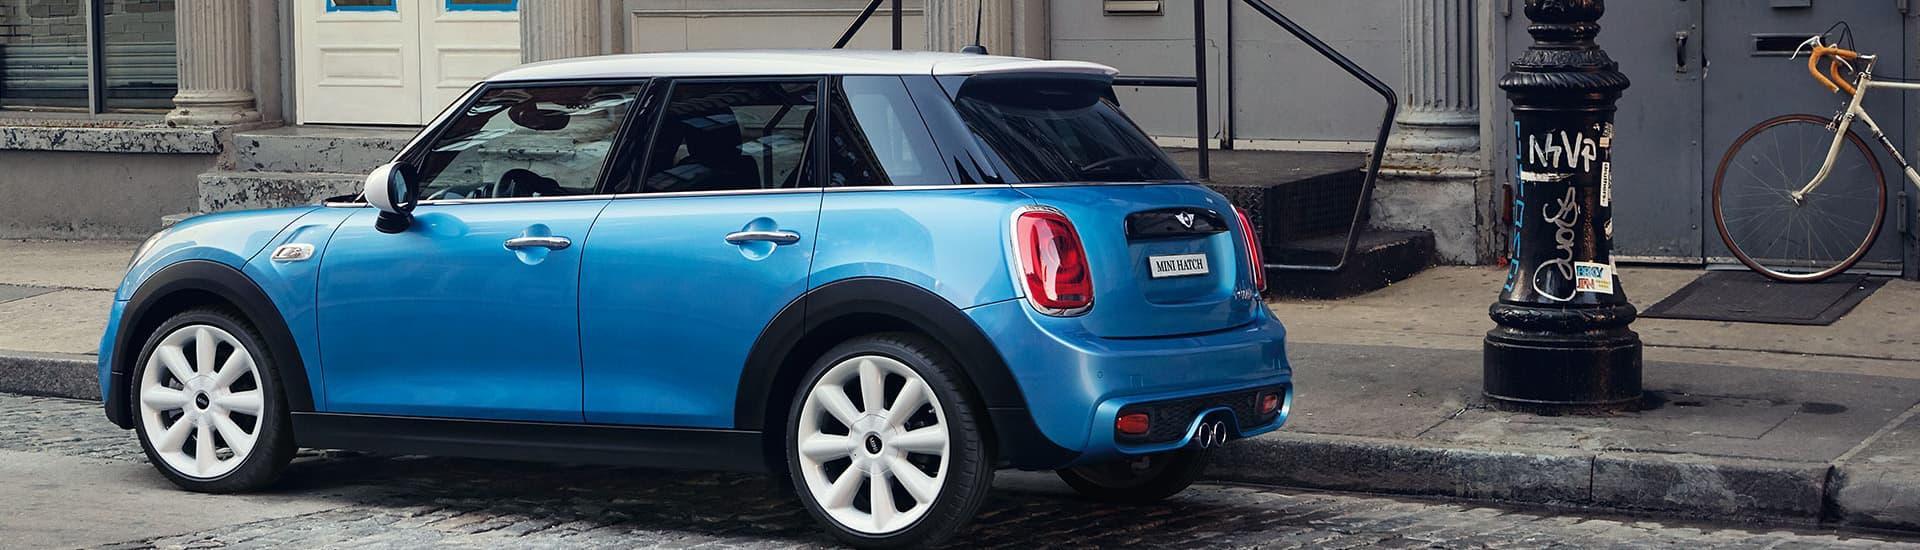 MINI NEXT Pre-Owned Cars - Premium Used Cars – carsales.com.au